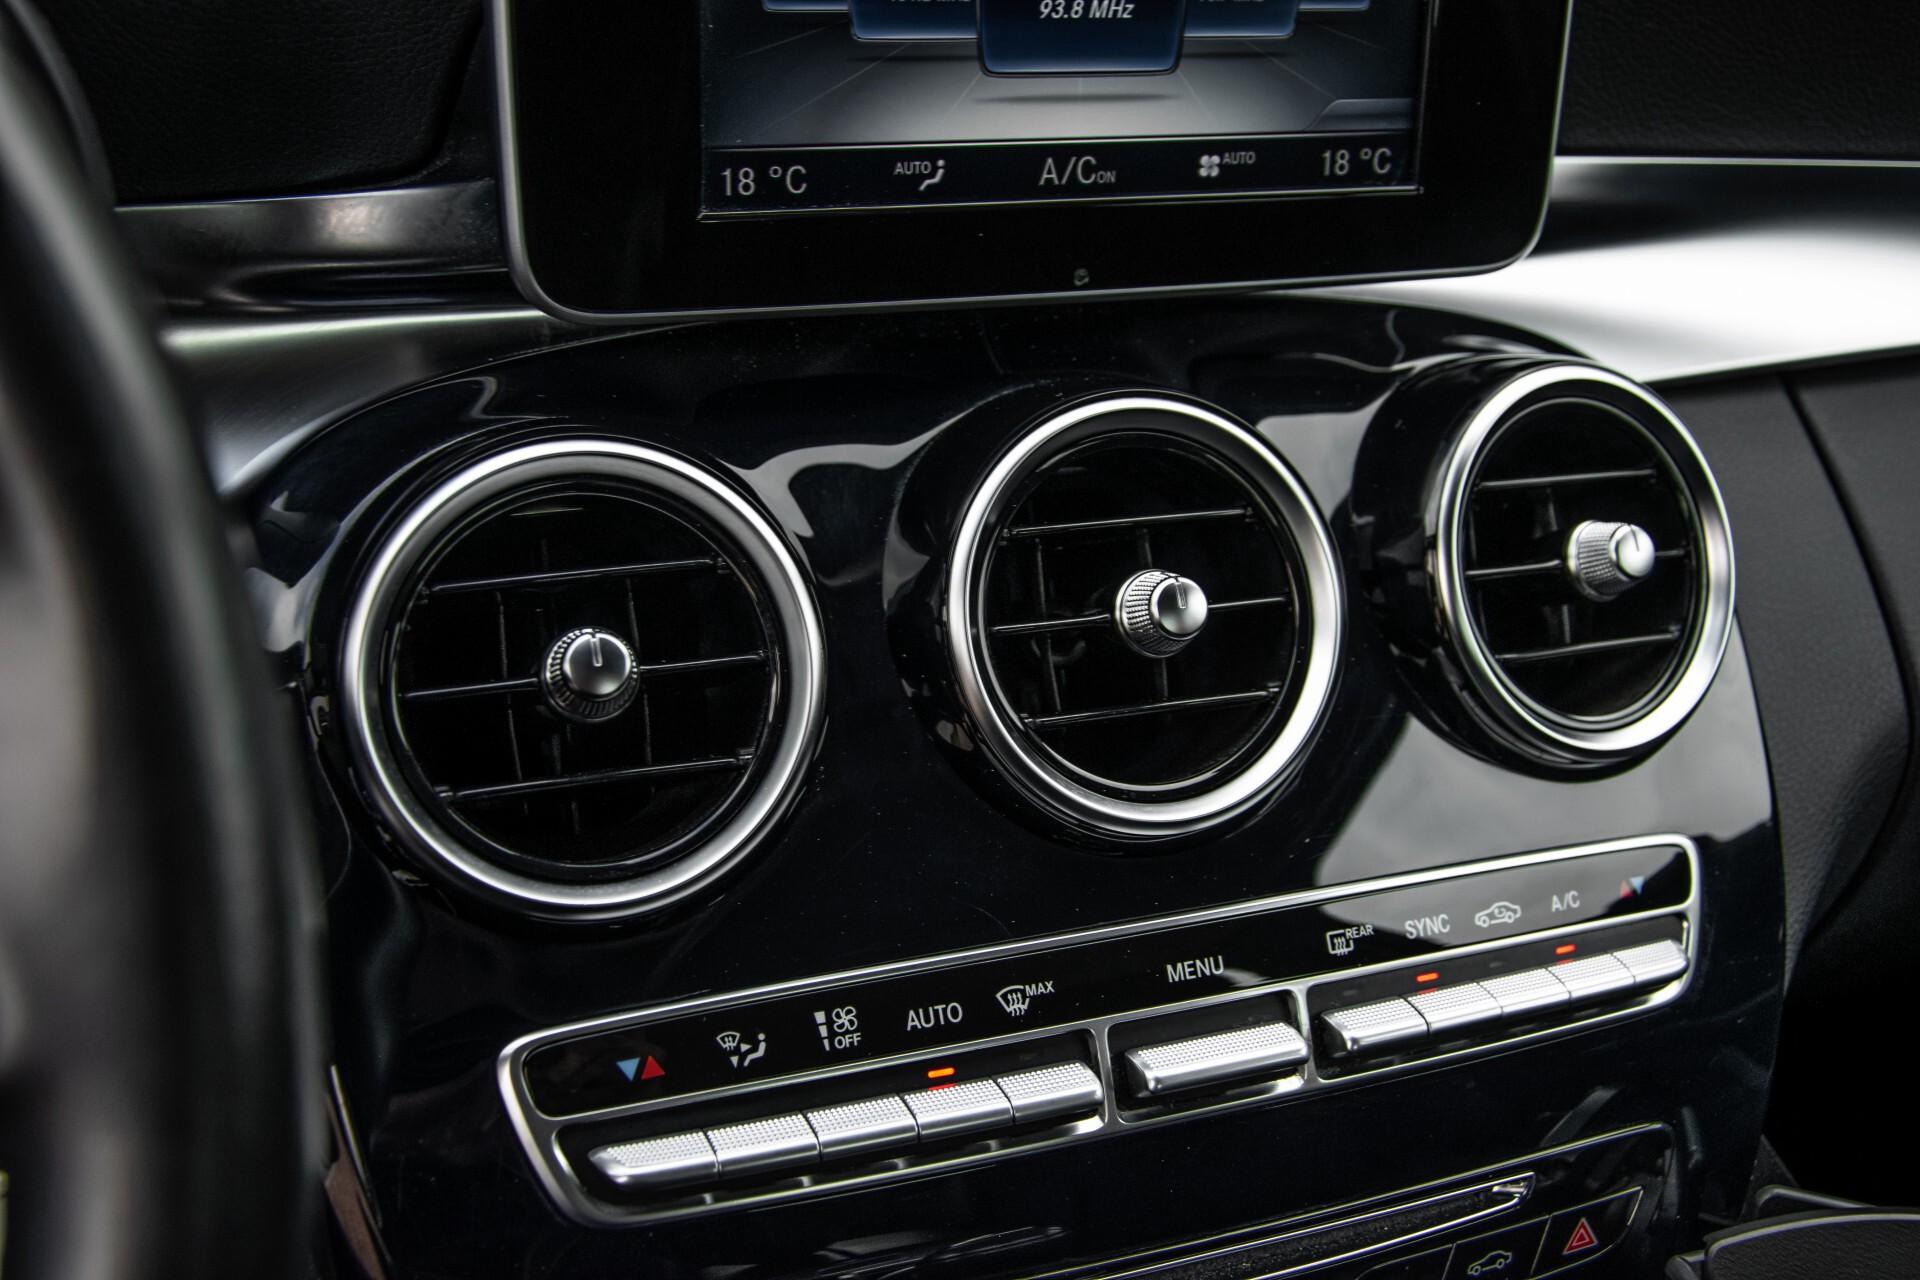 Mercedes-Benz C-Klasse 180 Bluetec Lease Edition Intelligent Light System/Cruise Control/Navi Foto 21